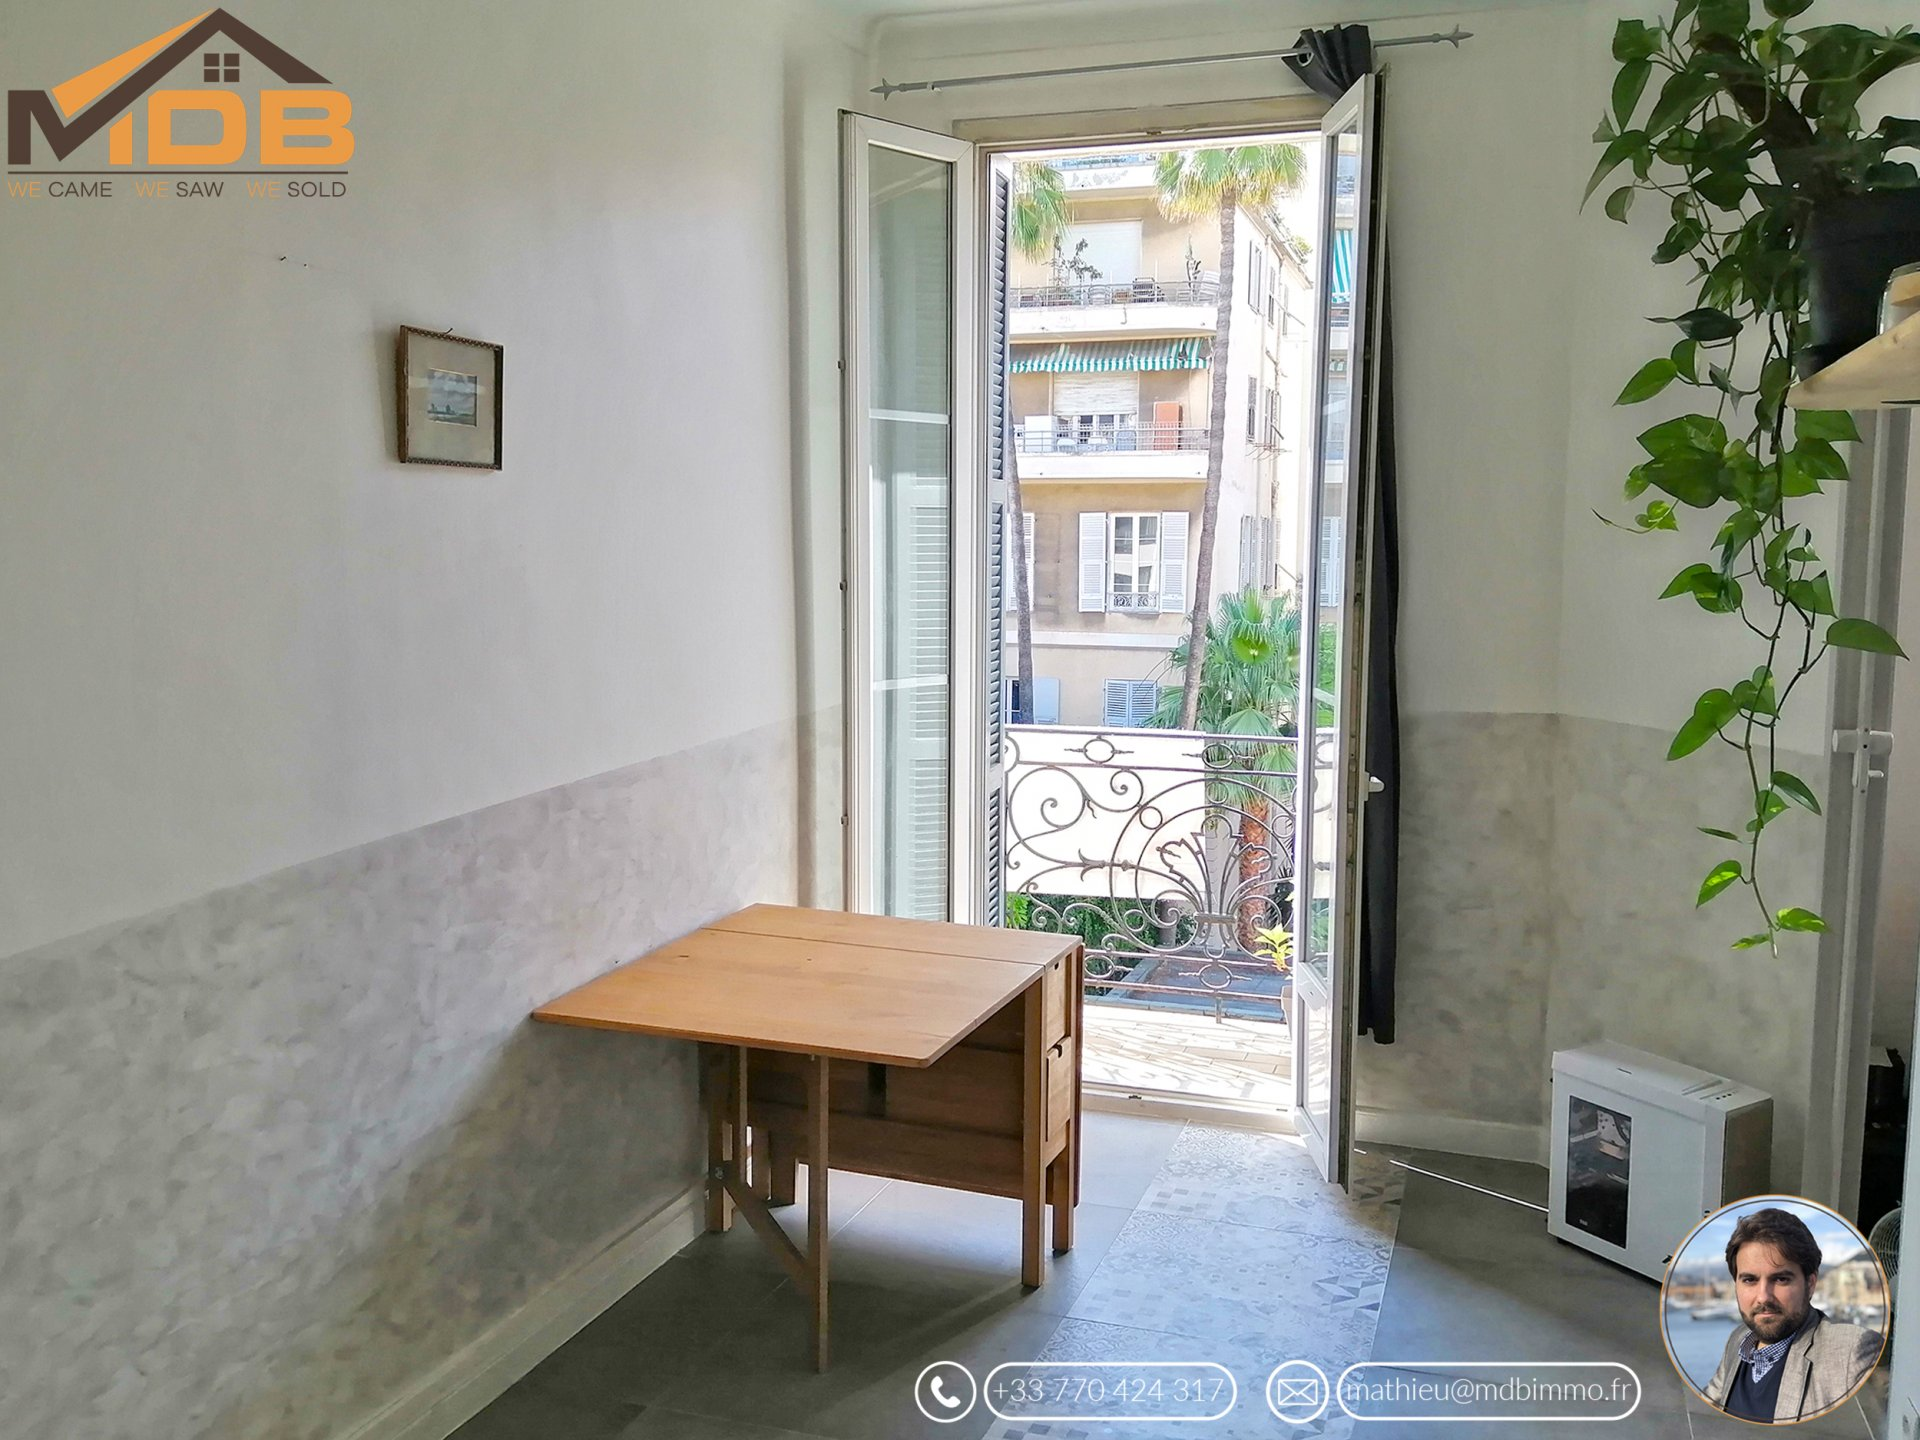 Nice Pastorelli - 2 pièces balcon climatisation